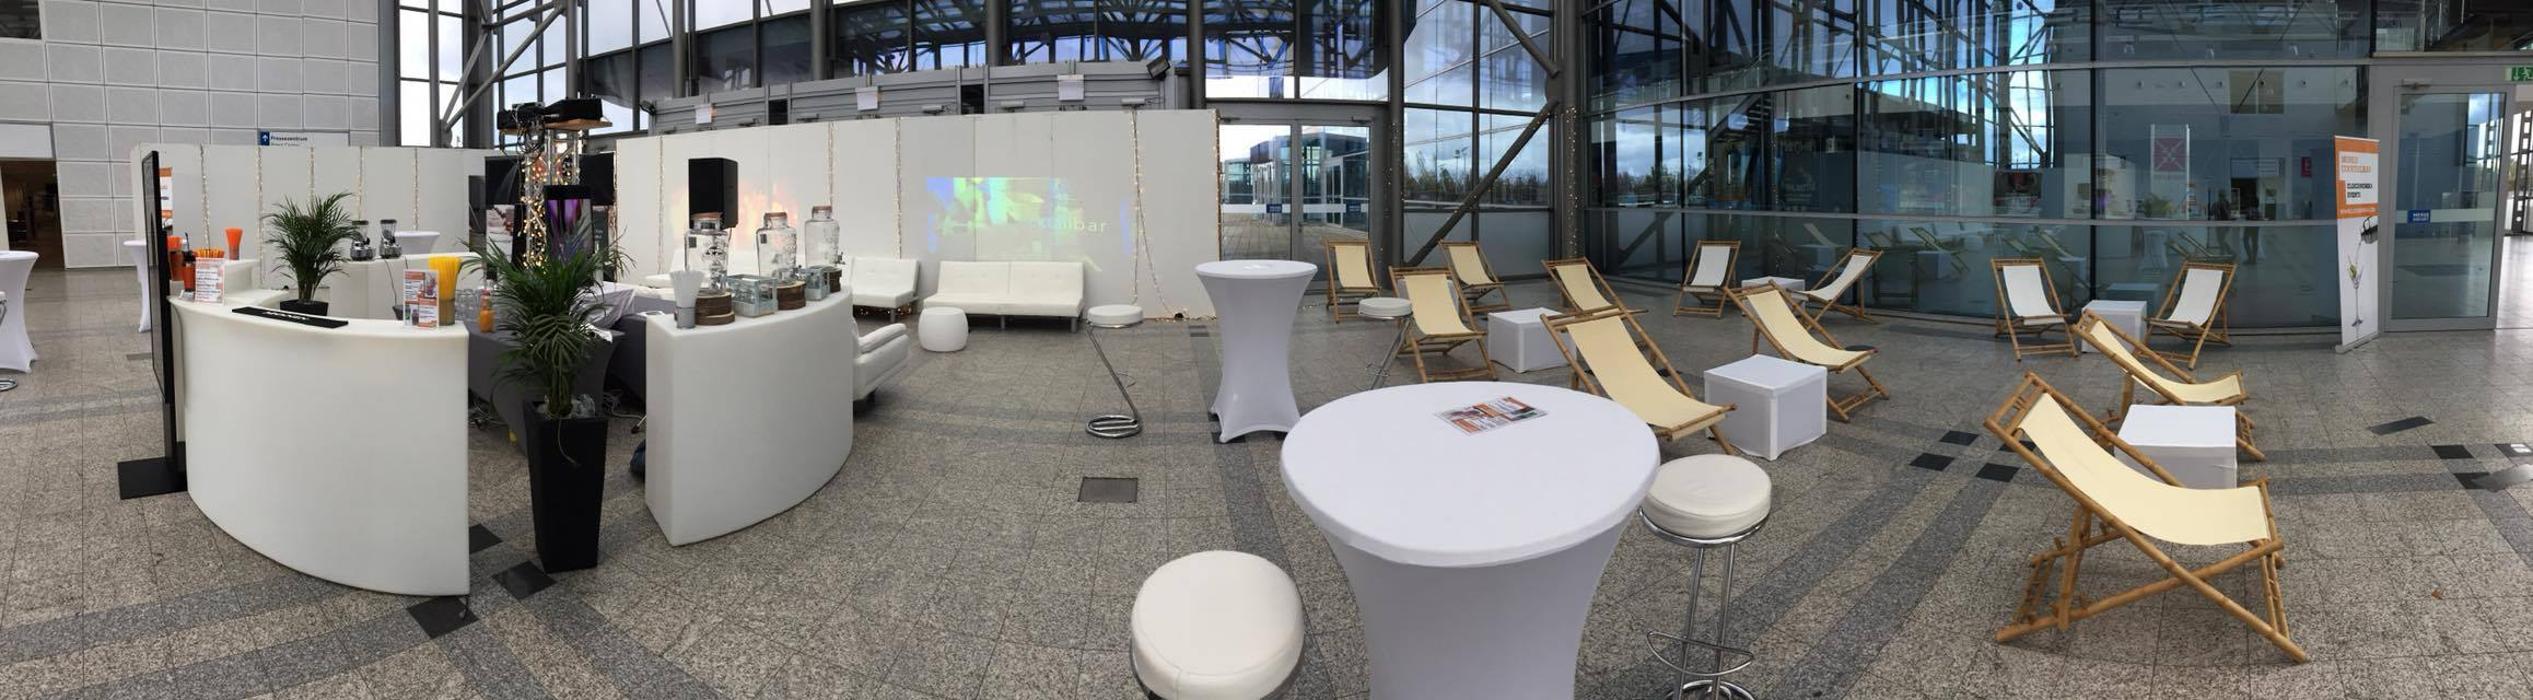 jelloo - Onlinemarketing - Clockwork4Events Leipzig & Eichsfeld in Leipzig